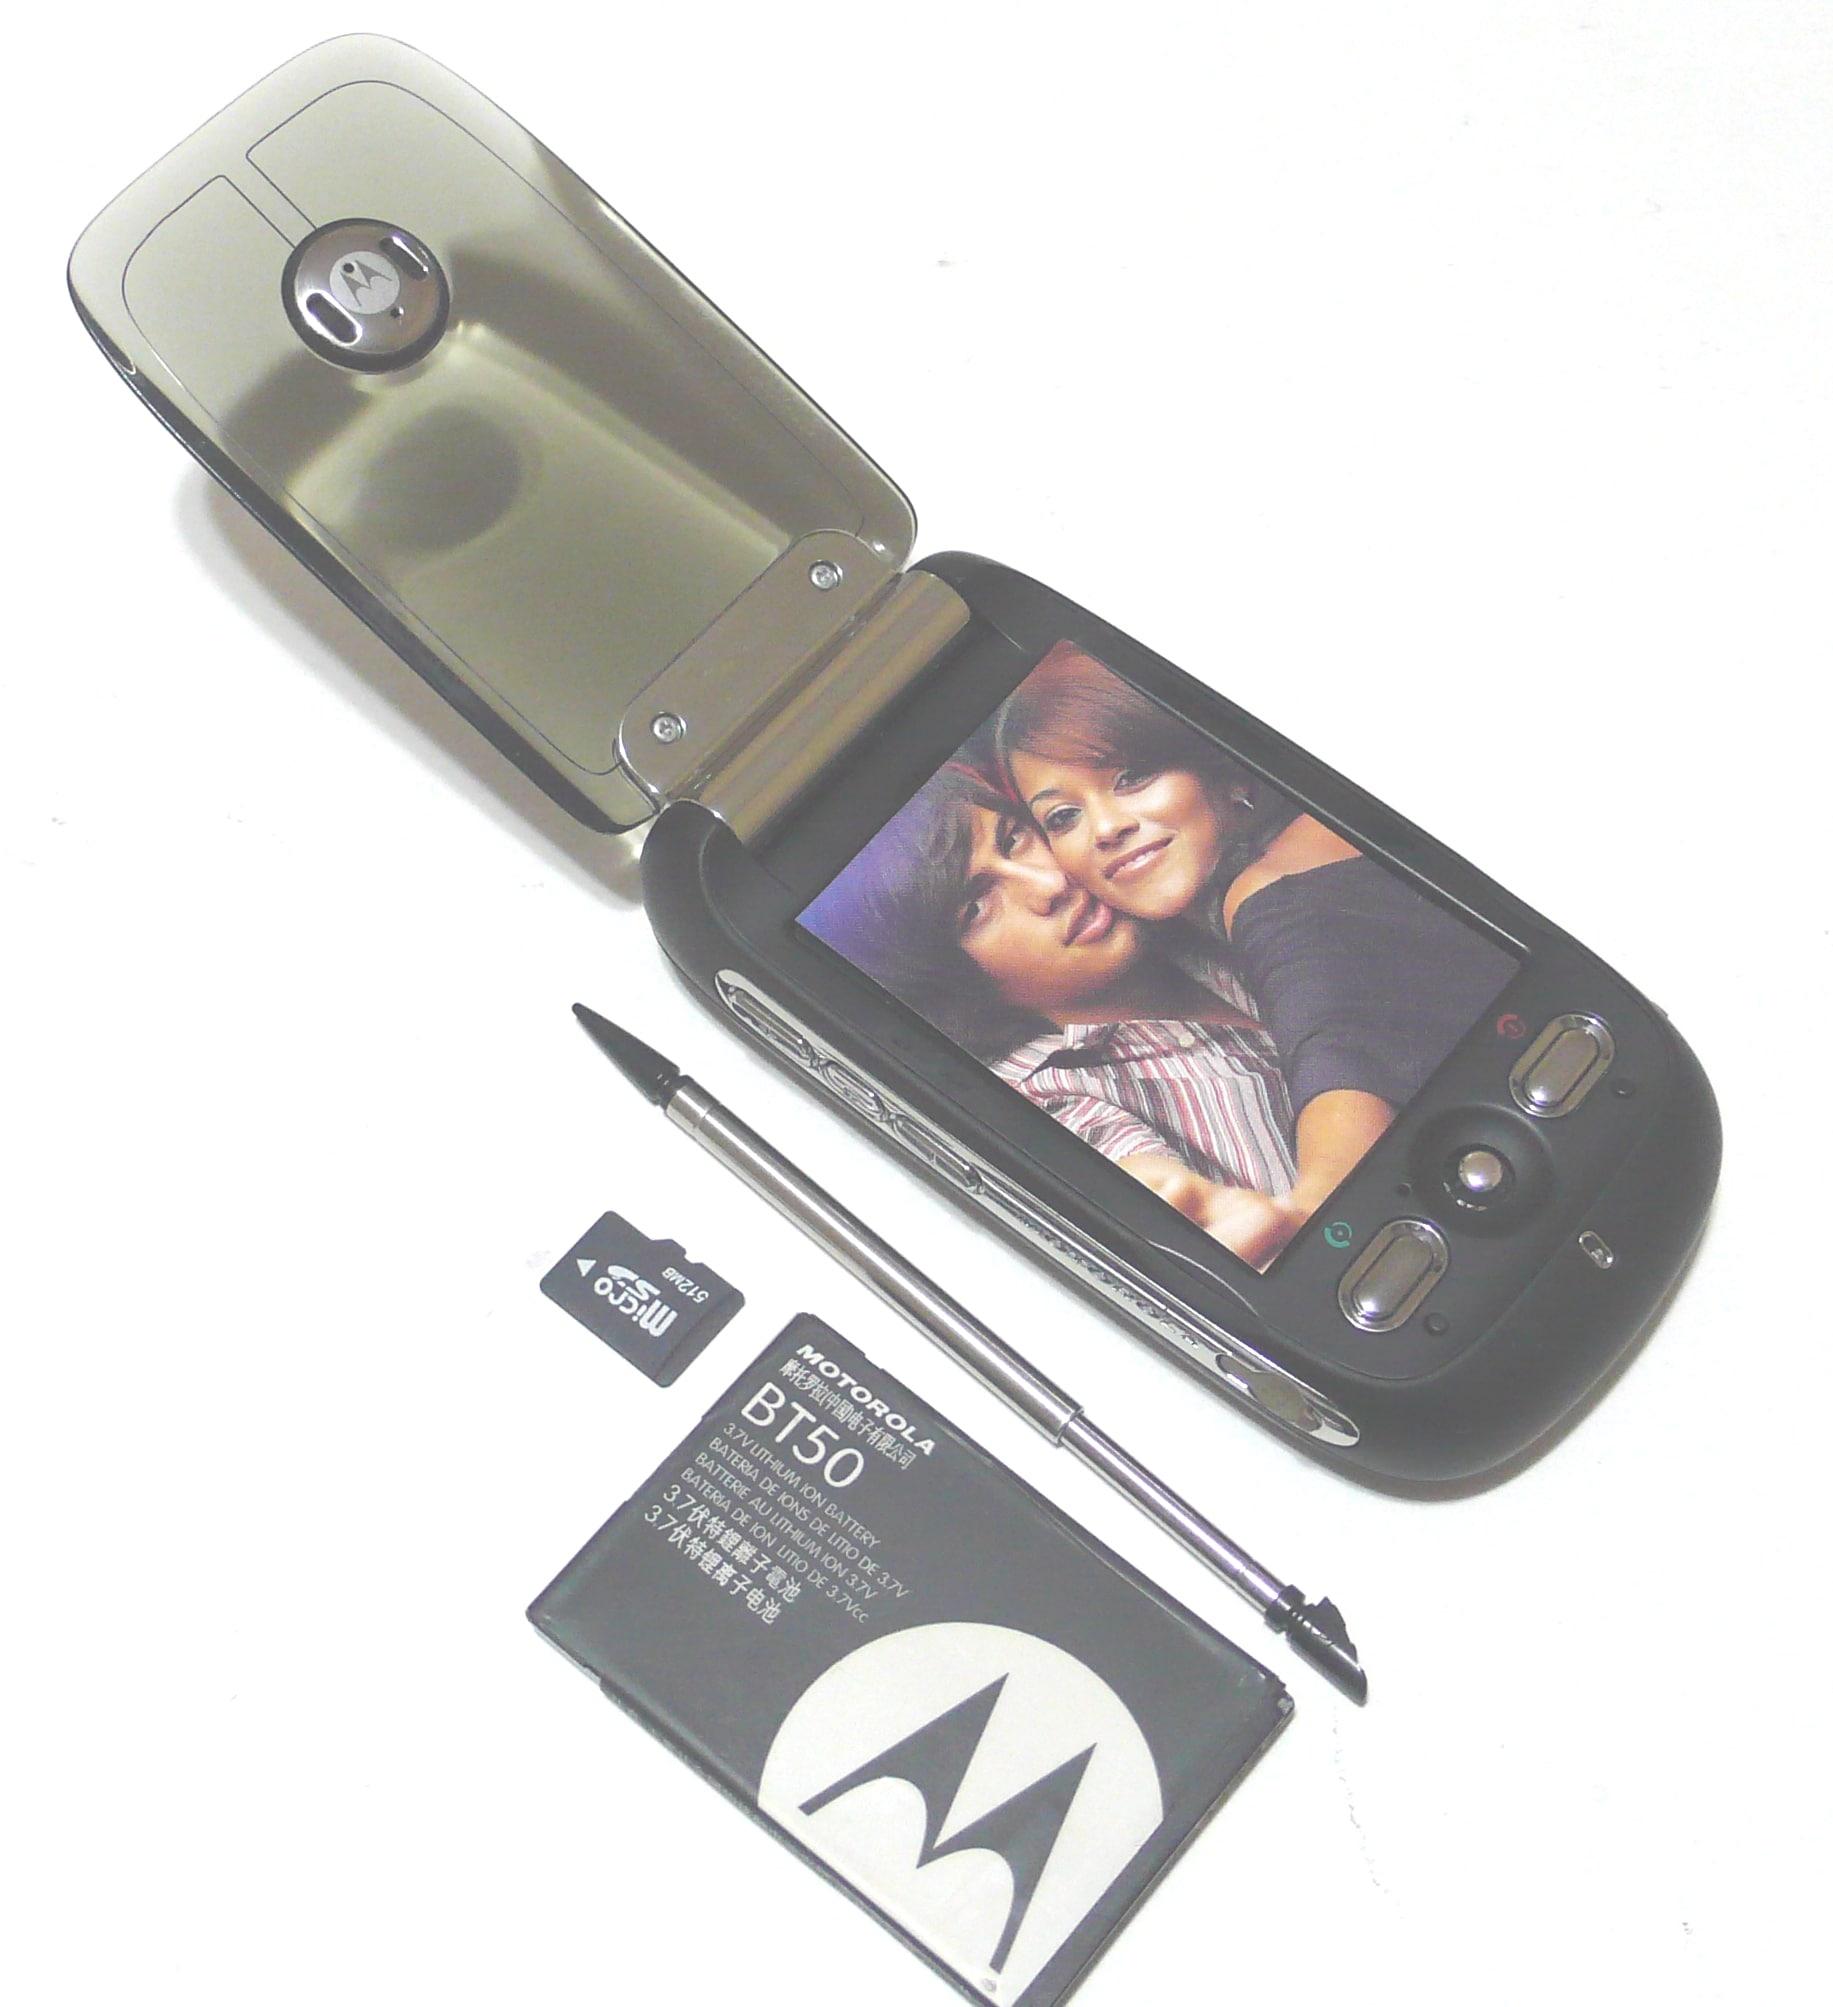 Motorola A1200 2.0MP Quadband PDA Cell Phone (Refurbished) - Thumbnail 1